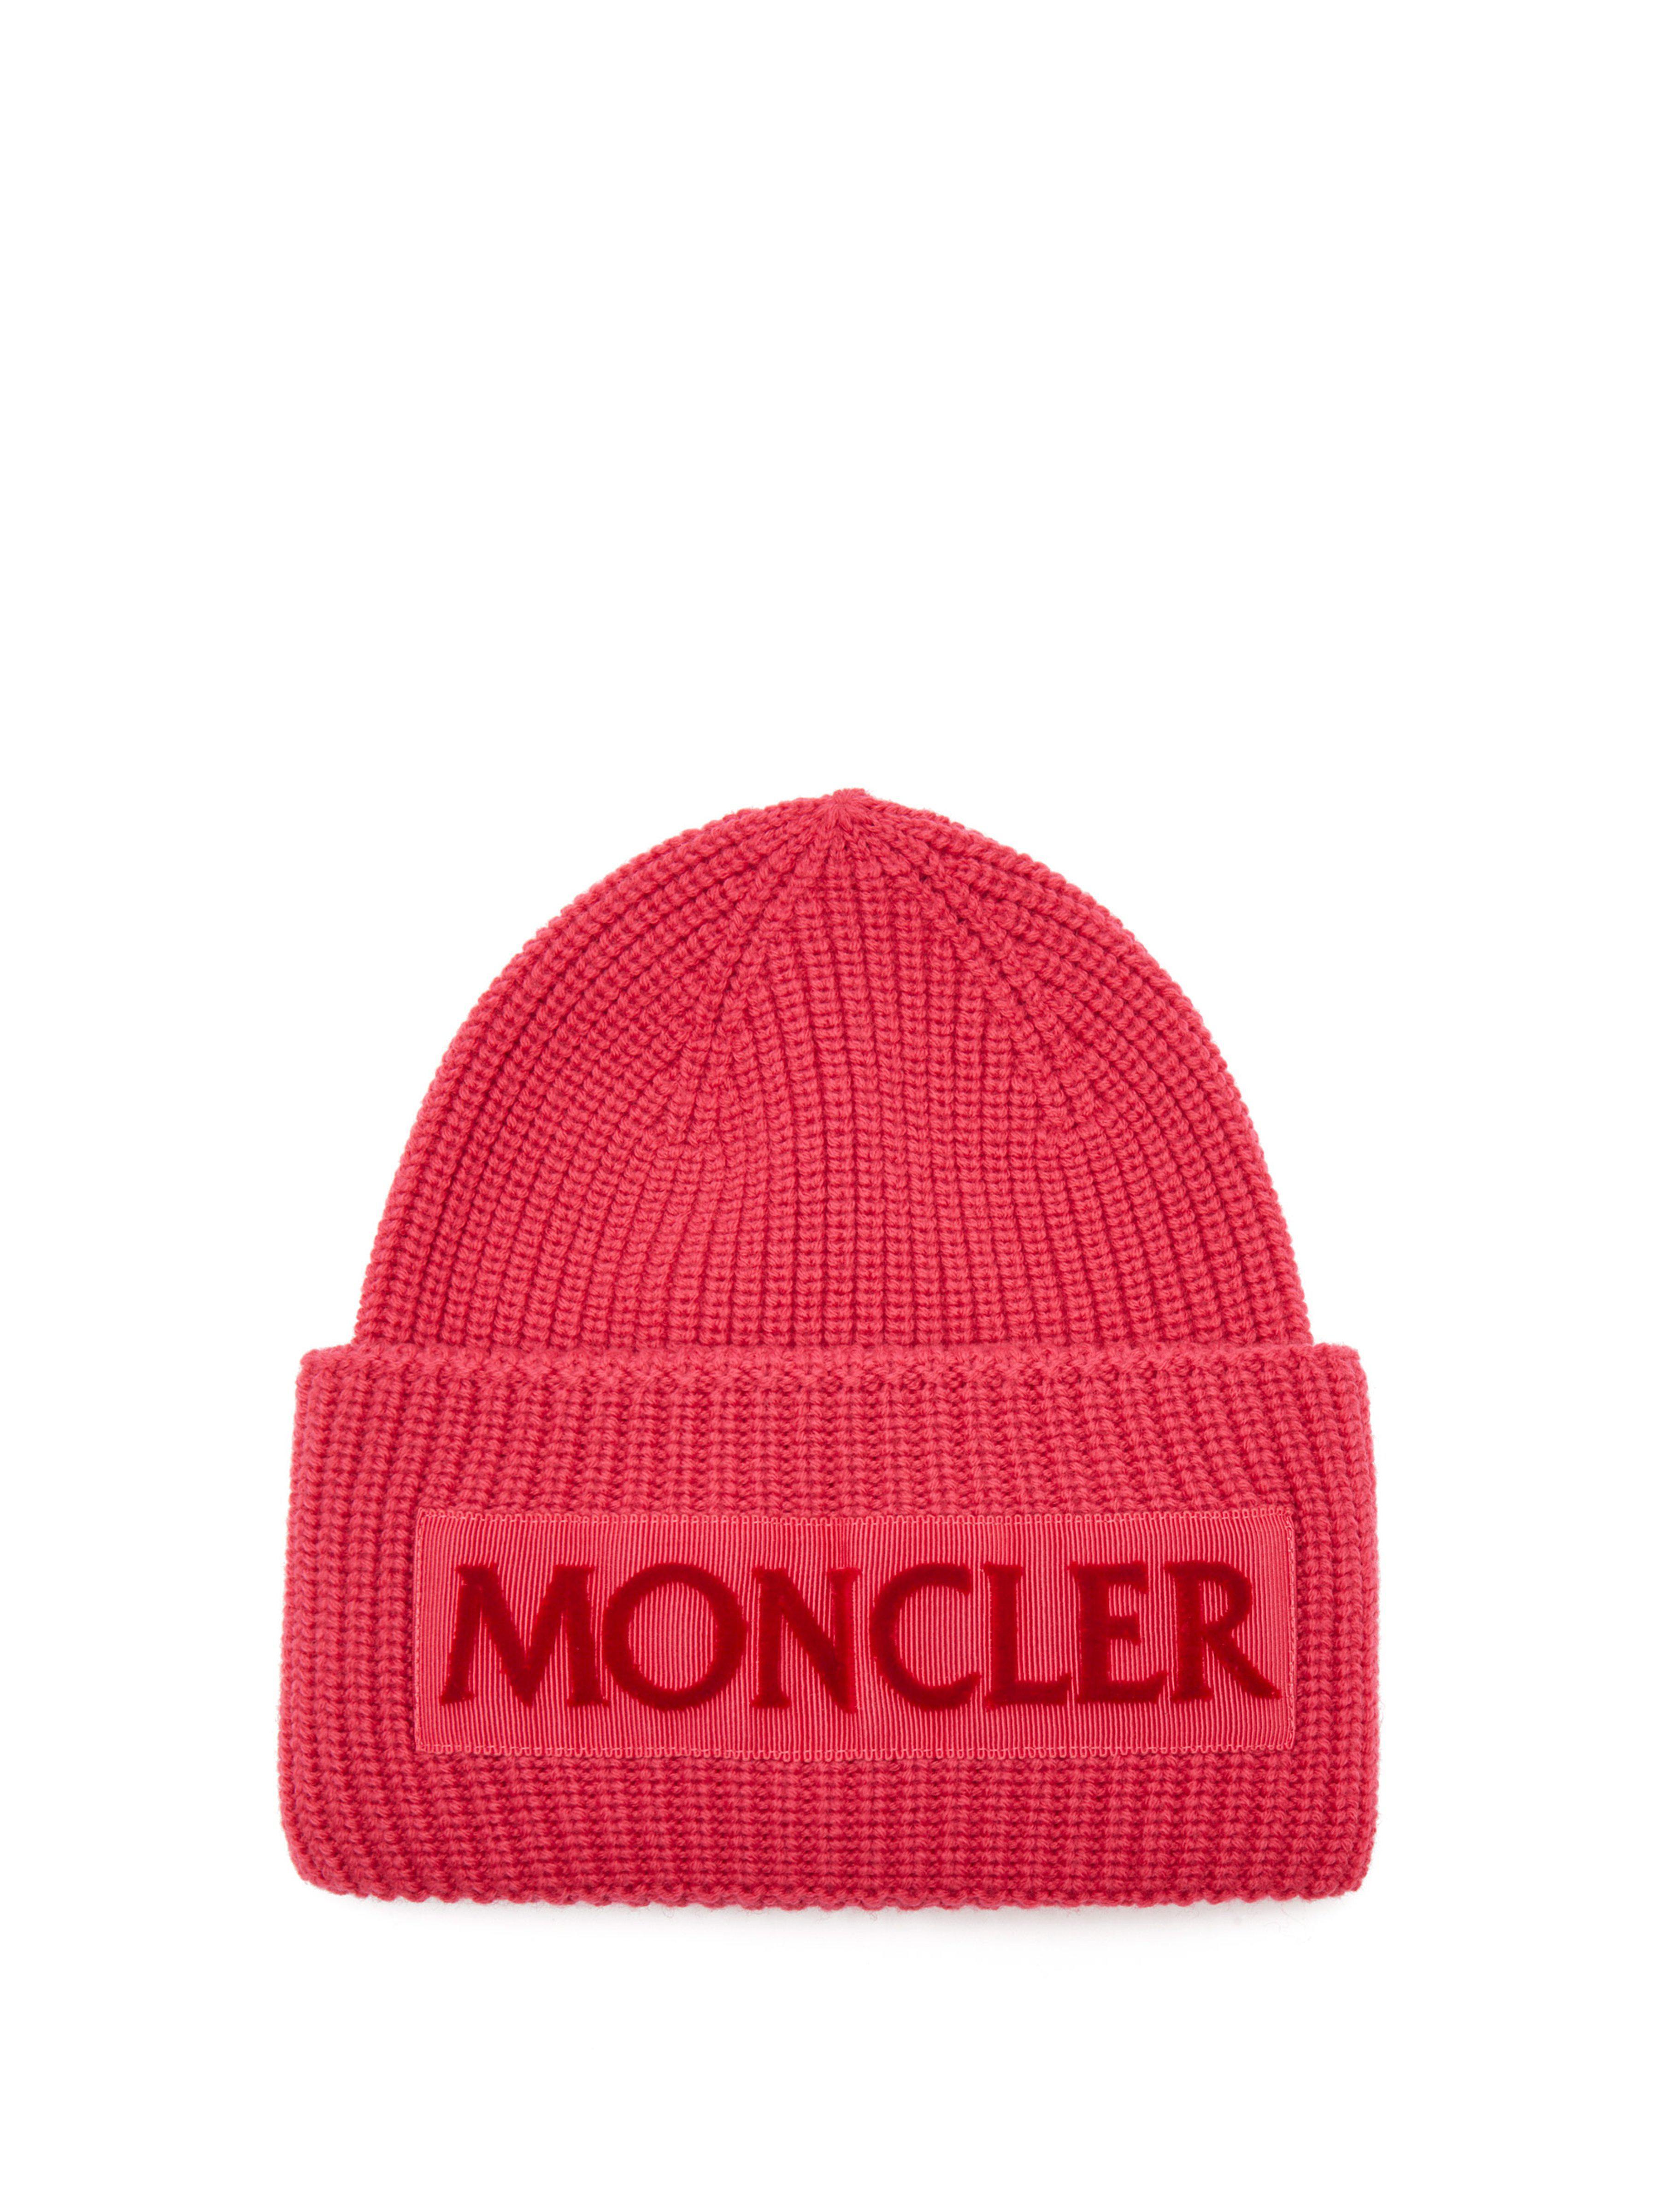 ba5fb625c87 Moncler - Pink Velvet Logo Wool Beanie Hat - Lyst. View fullscreen